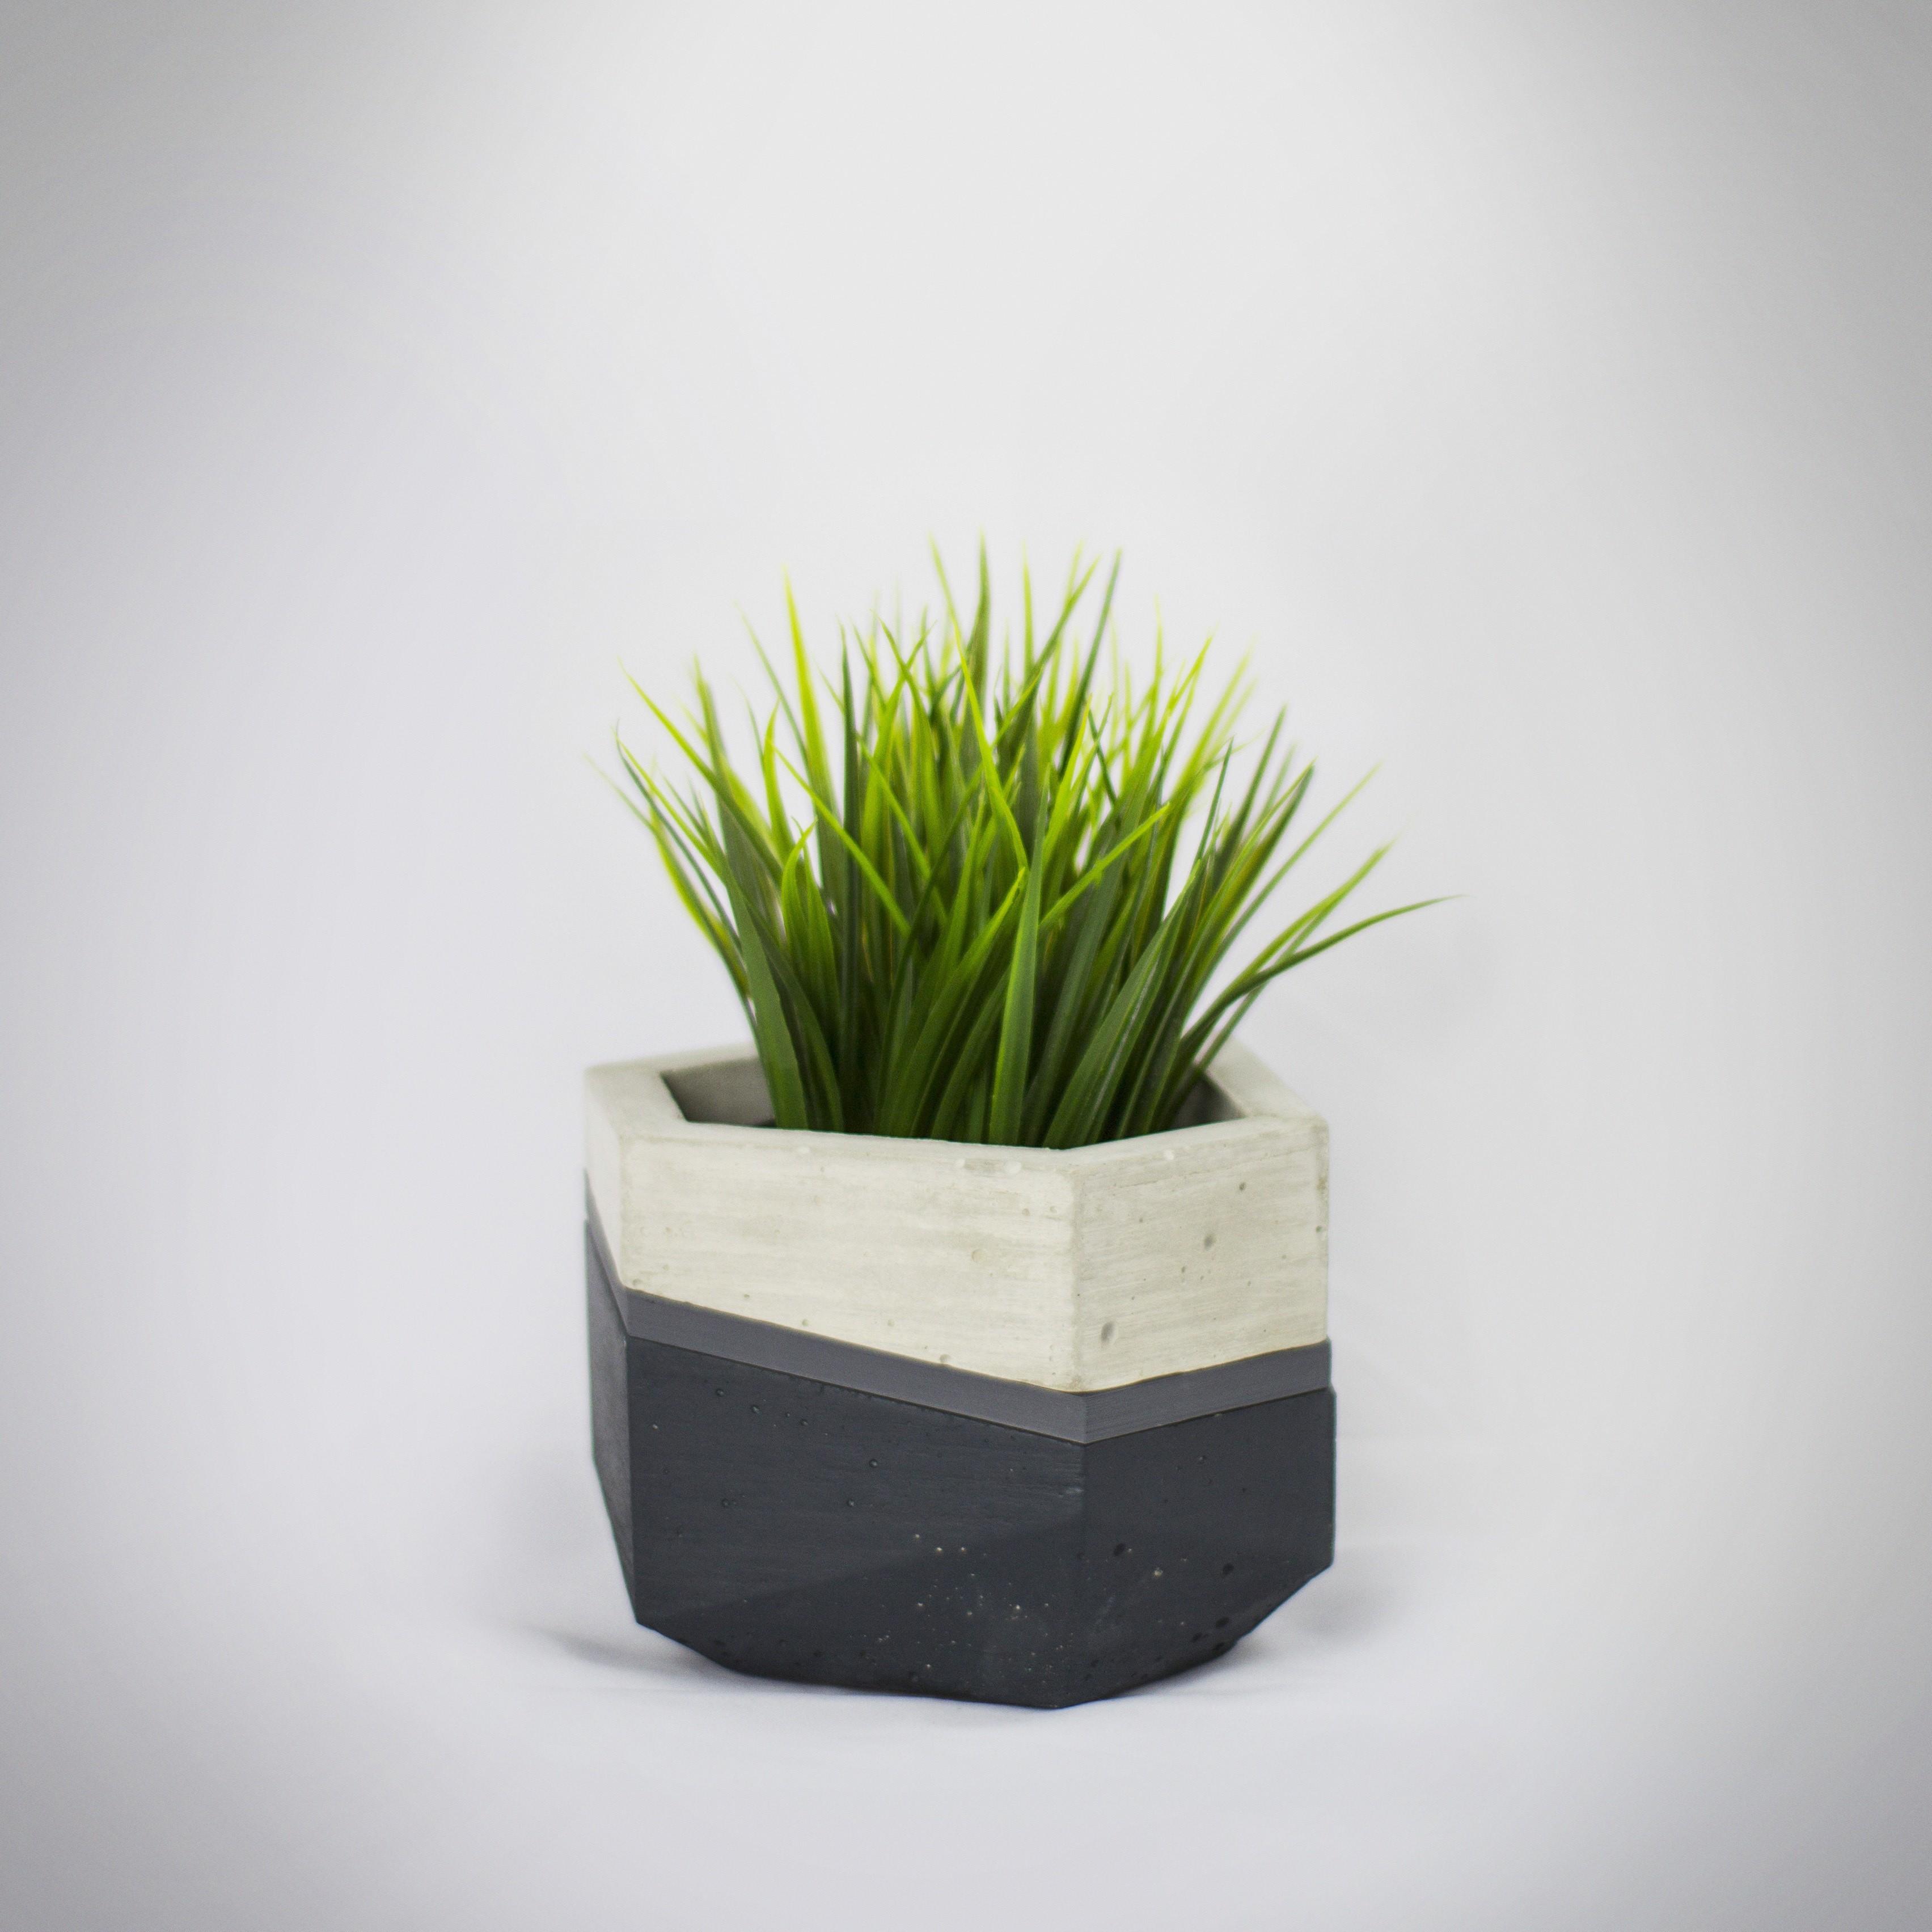 Macetero 1 insta.jpg Download free STL file Concrete Planters Mold • 3D print model, dukedoks